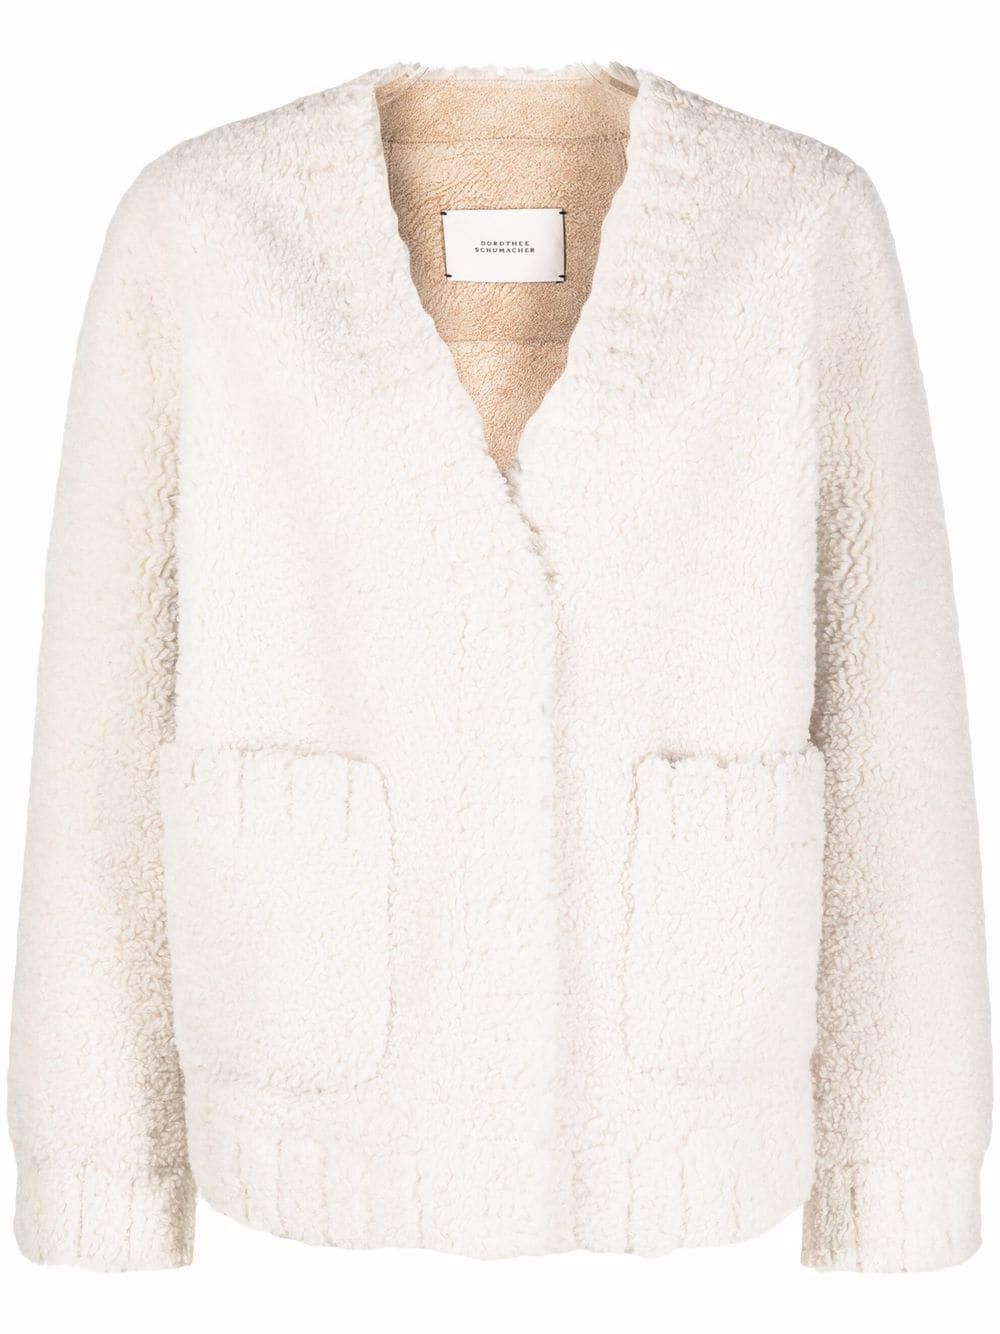 Twist On Shearling Jacket Item # 213-444202